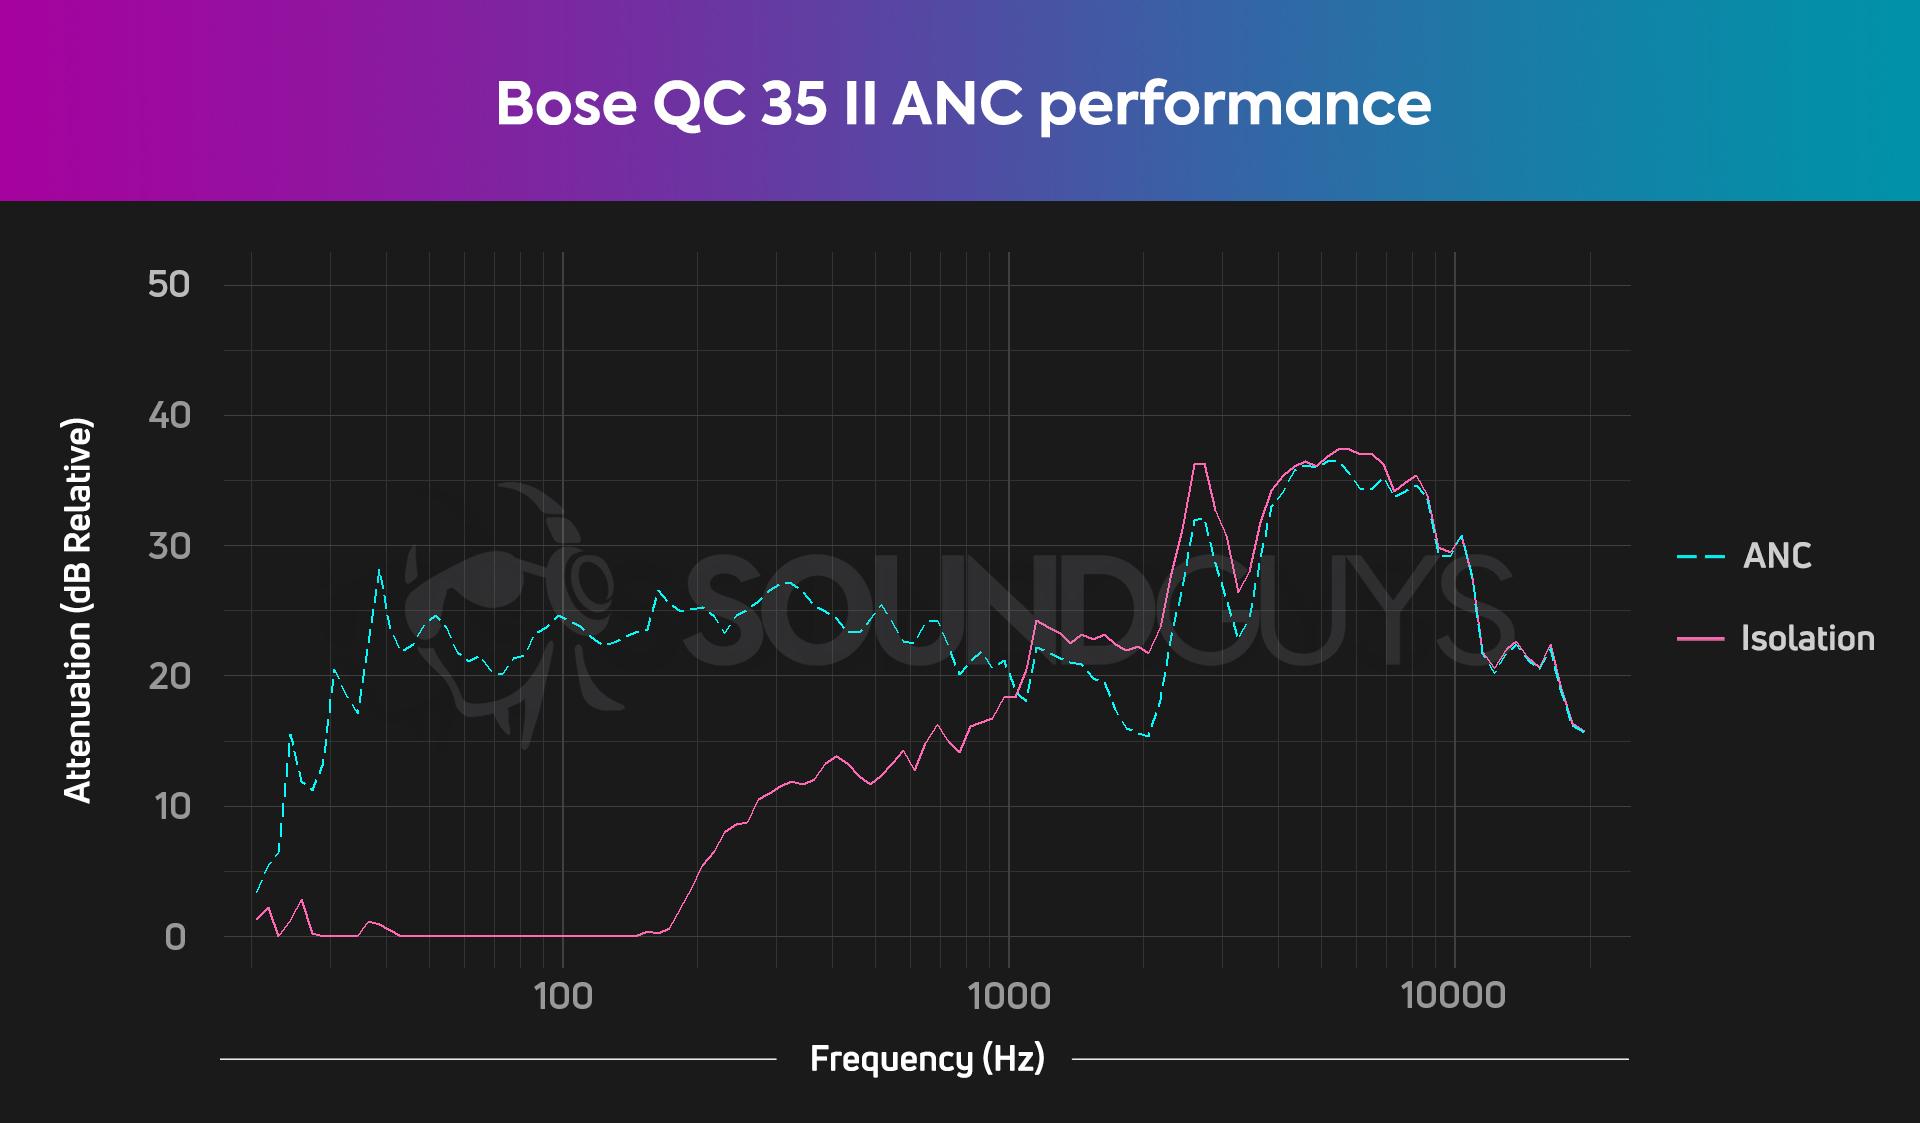 bose quietcomfort 35 ii anc performance chart